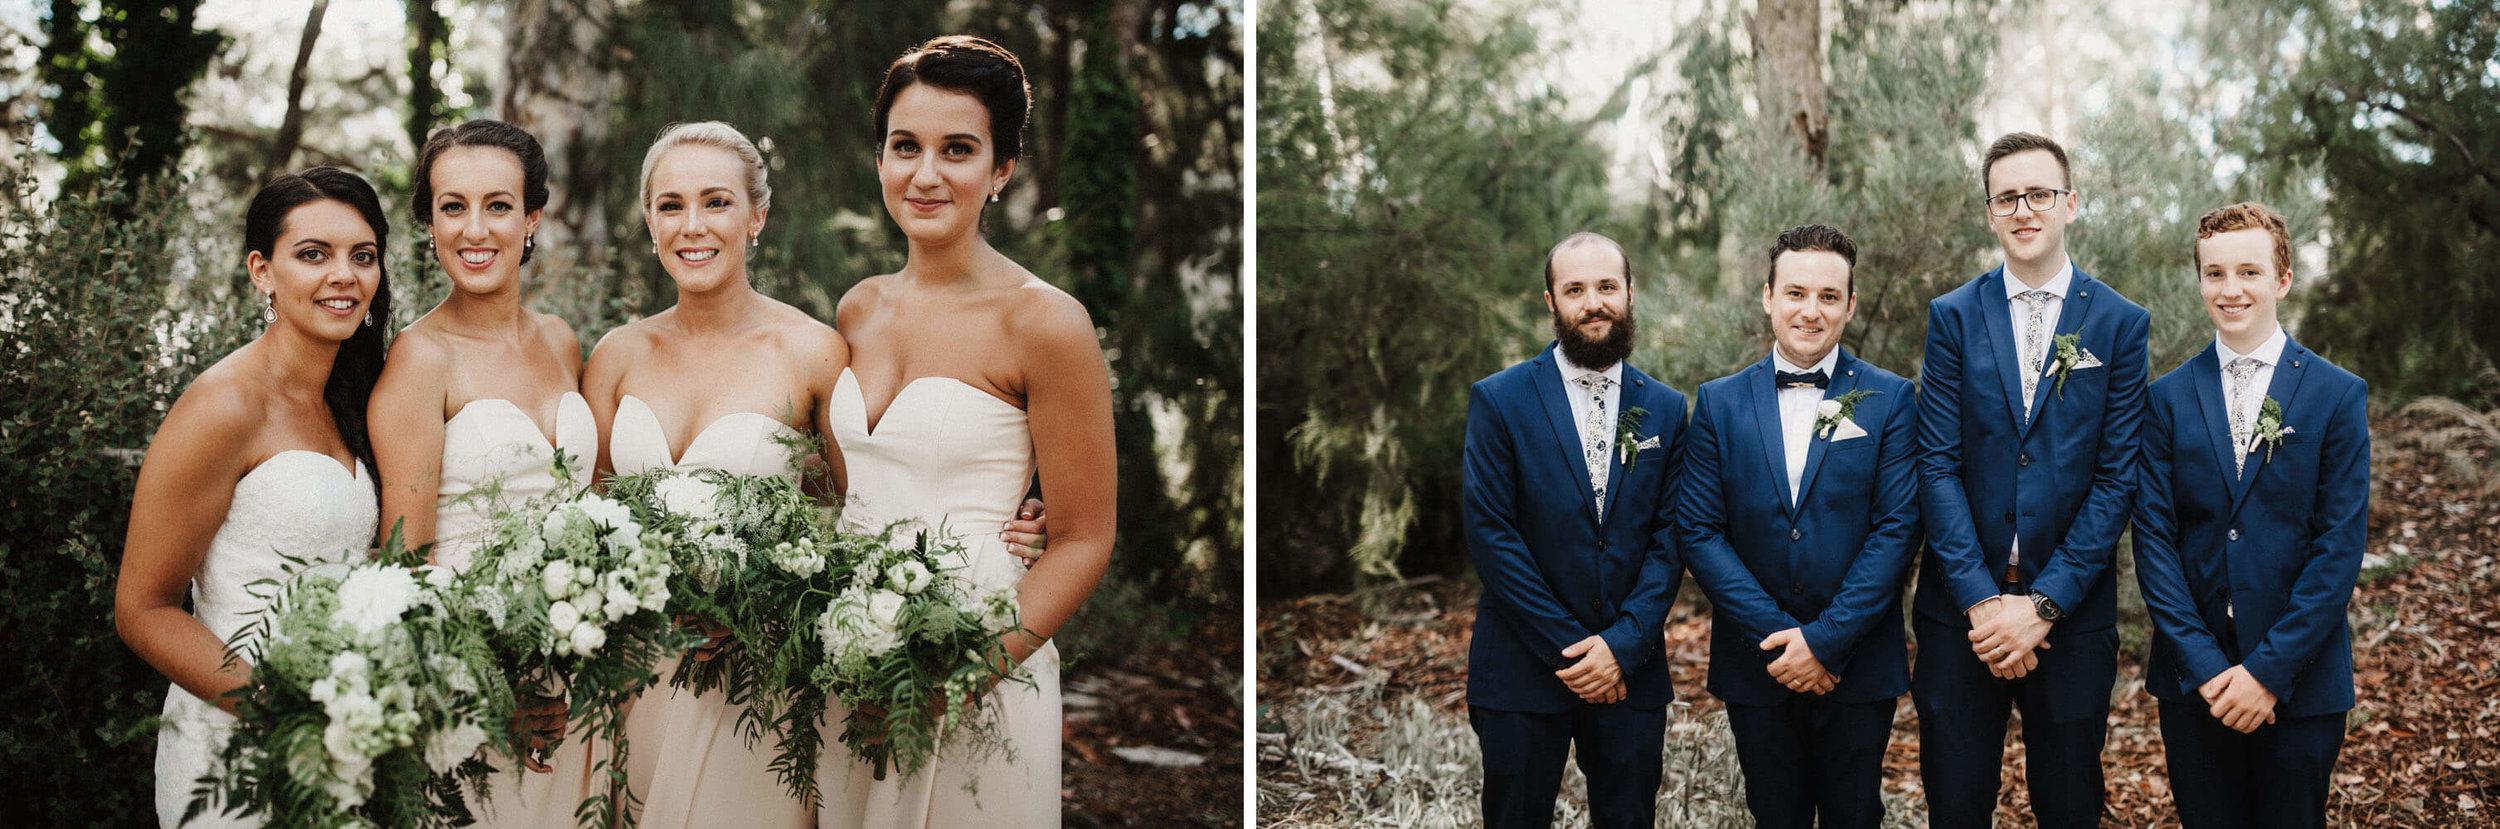 wedding-national-gallery-australia-94(6128)2.jpg